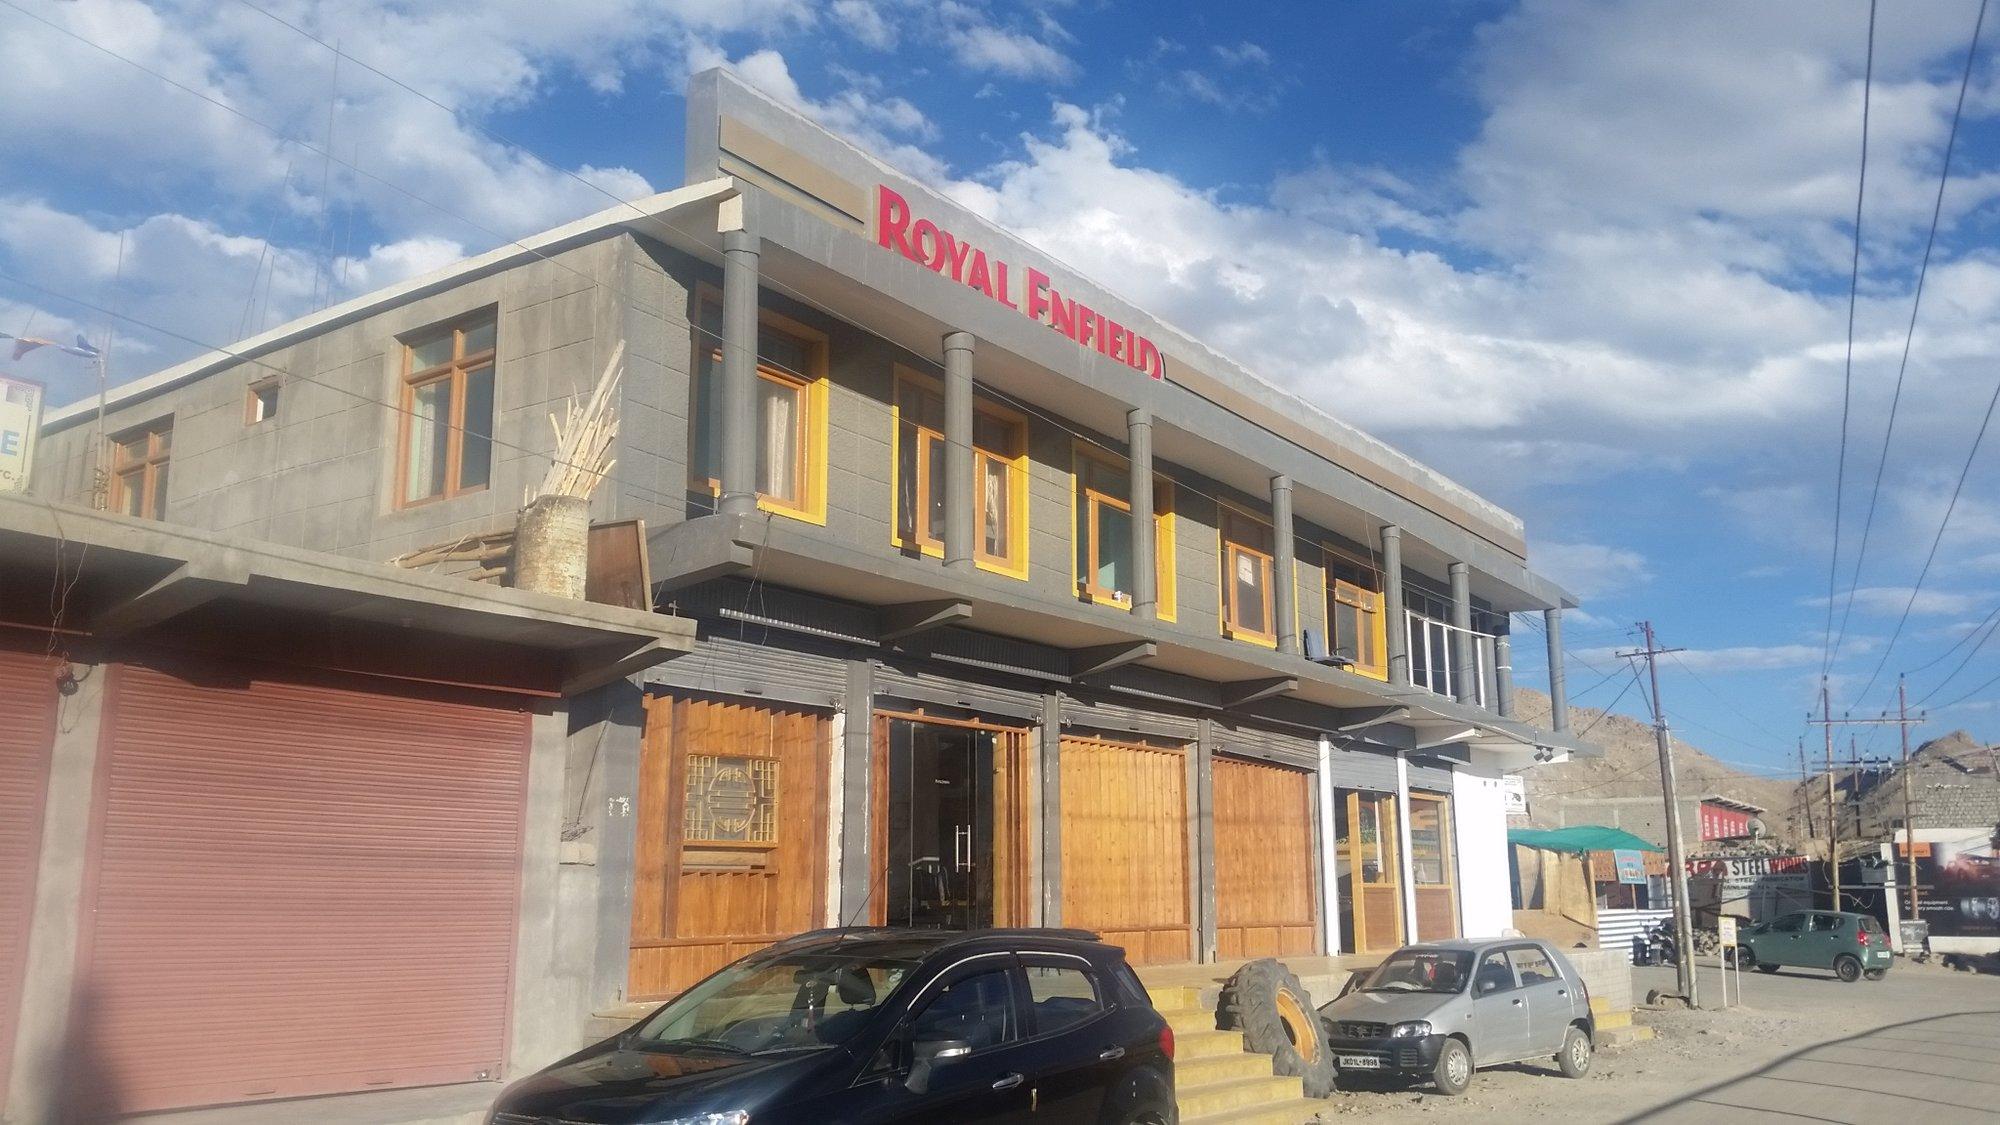 2018-09-06 Royal Enfield shop-Leh .jpg